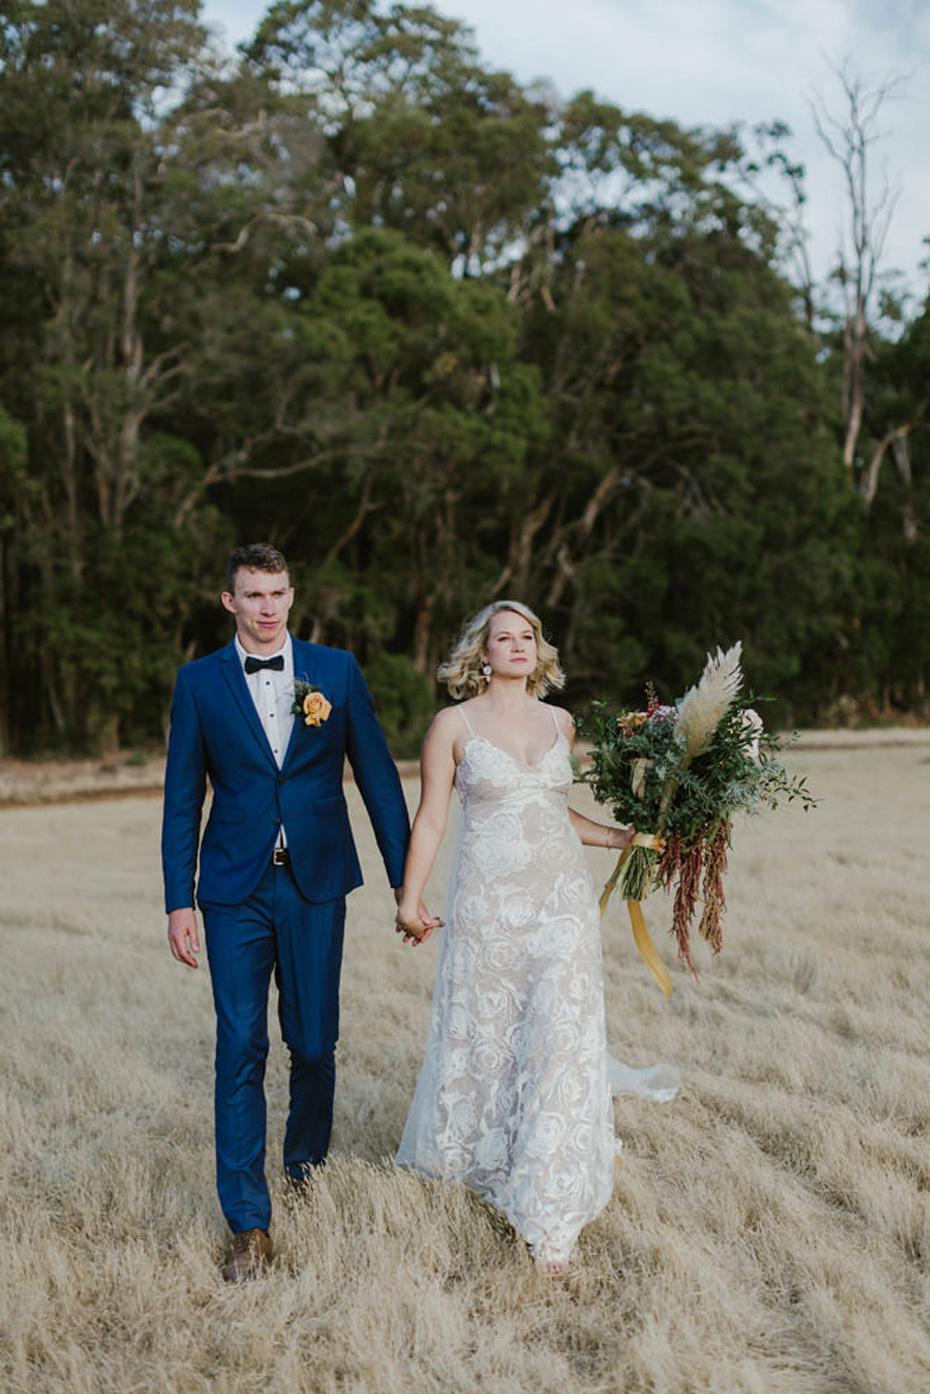 005-mornington-springs-wedding.jpg